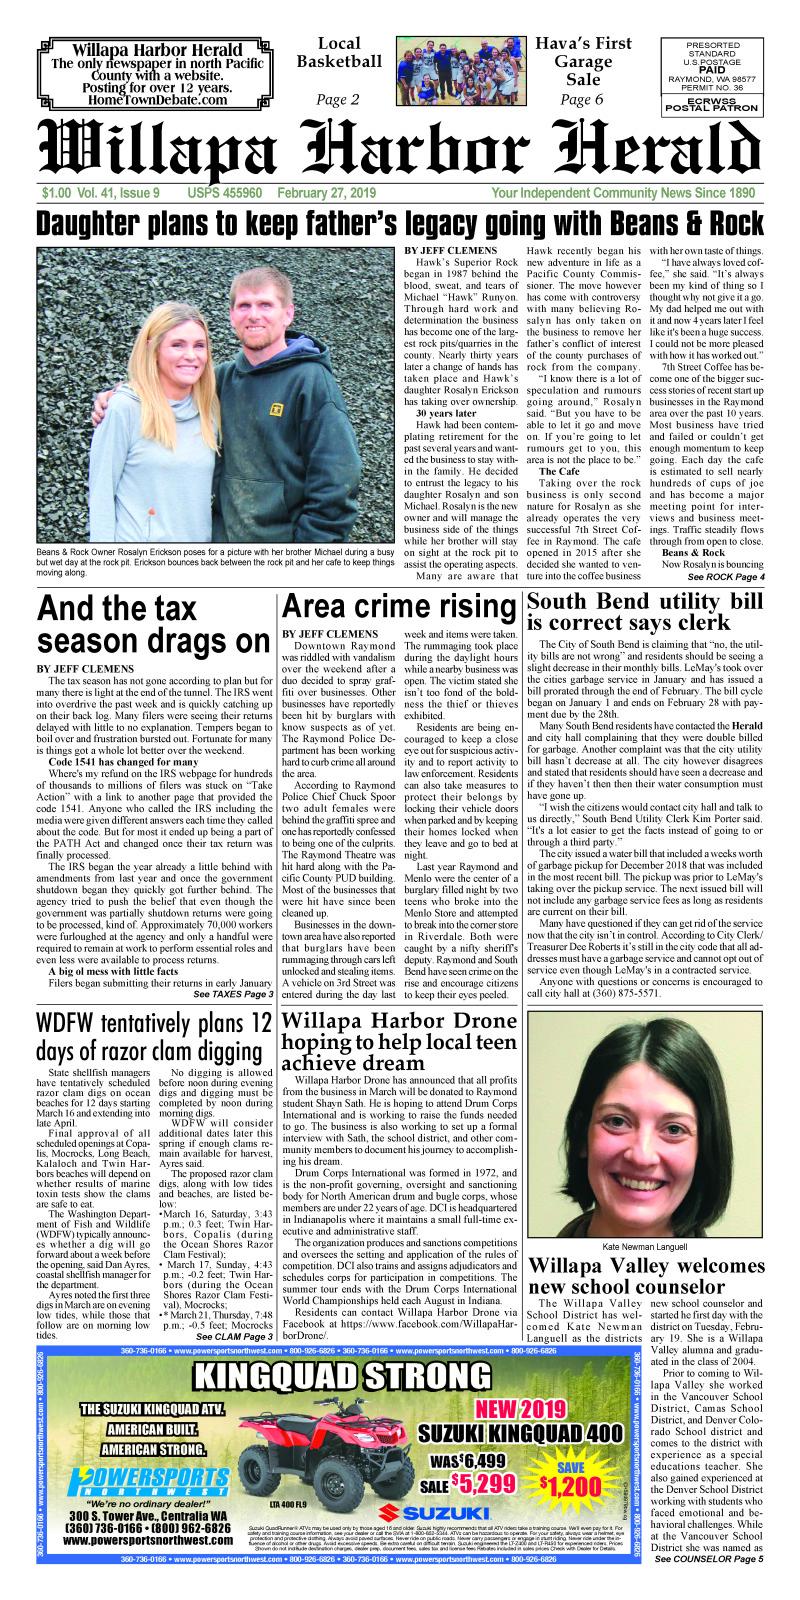 February 27, 2019 Willapa Harbor Herald